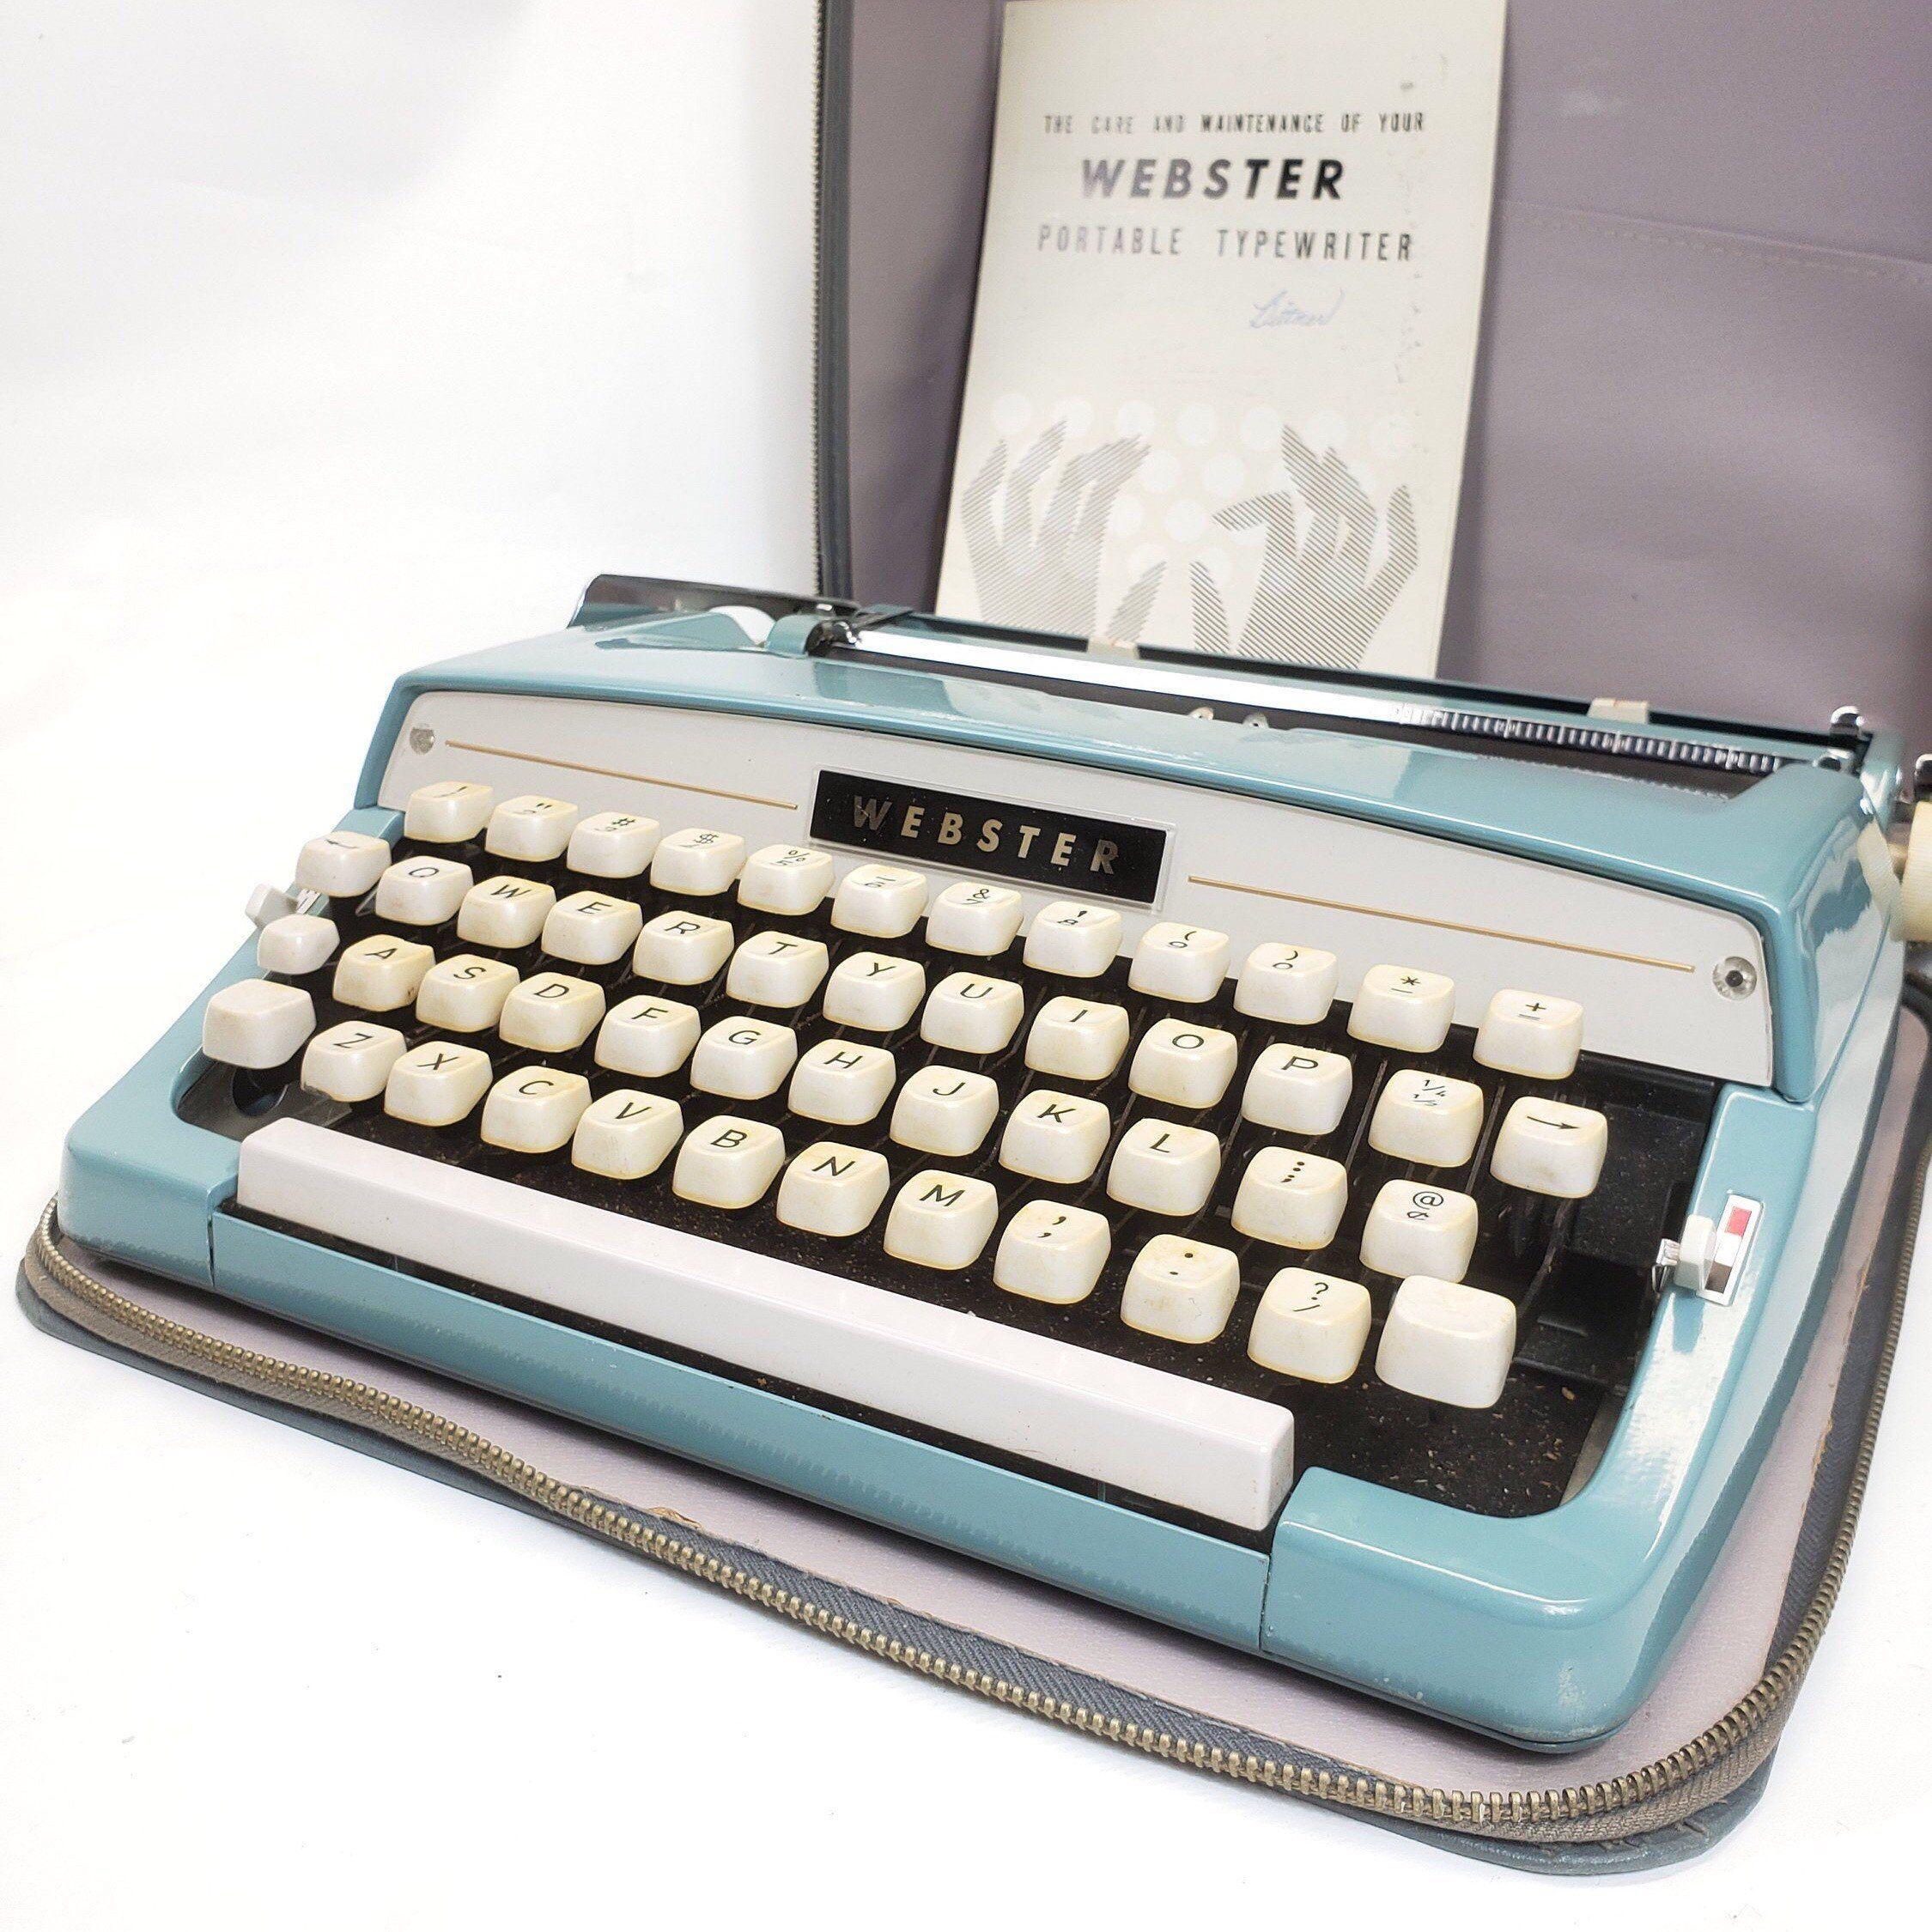 Excited to share this item from my #etsy shop: Typewriter, webster, aqua, Brother typewriter, Japan, case, metal, blue #portable #travel #smalltypewriter #manualtypewriter #midcentury #blue #vintage #japan #typewriter